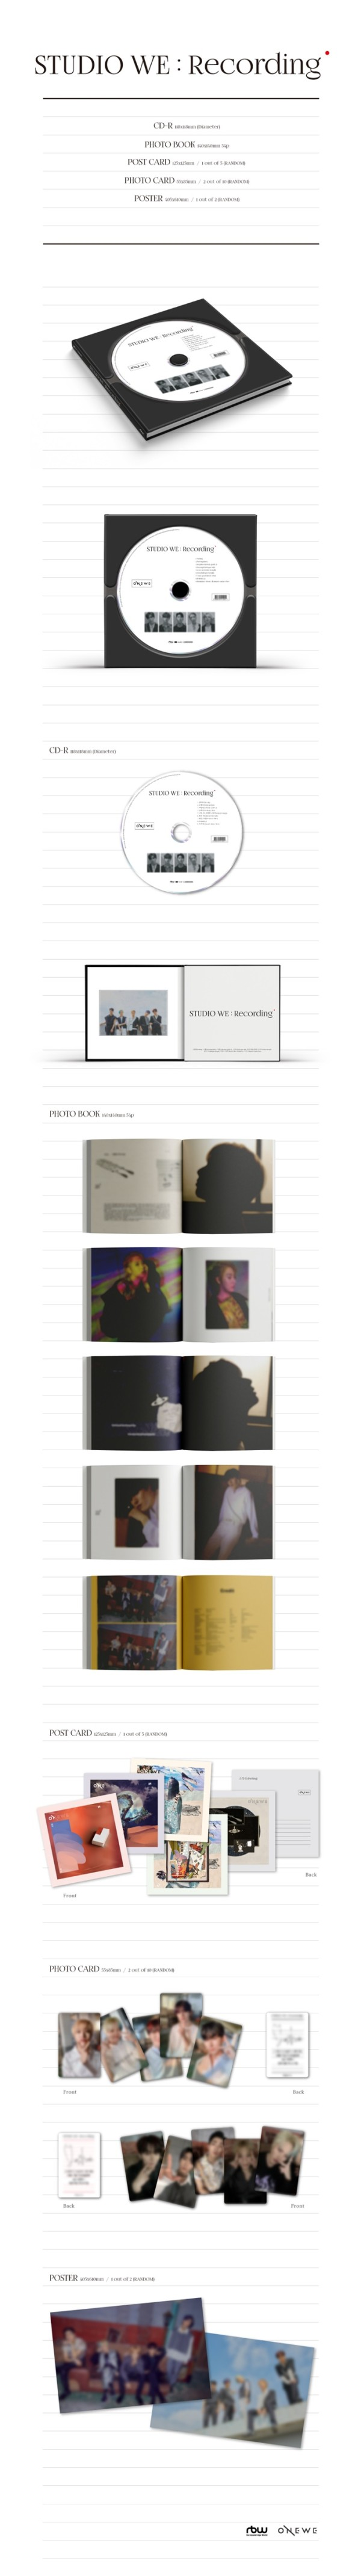 ONEWE|韓国ファースト・デモアルバム『STUDIO WE : Recording』